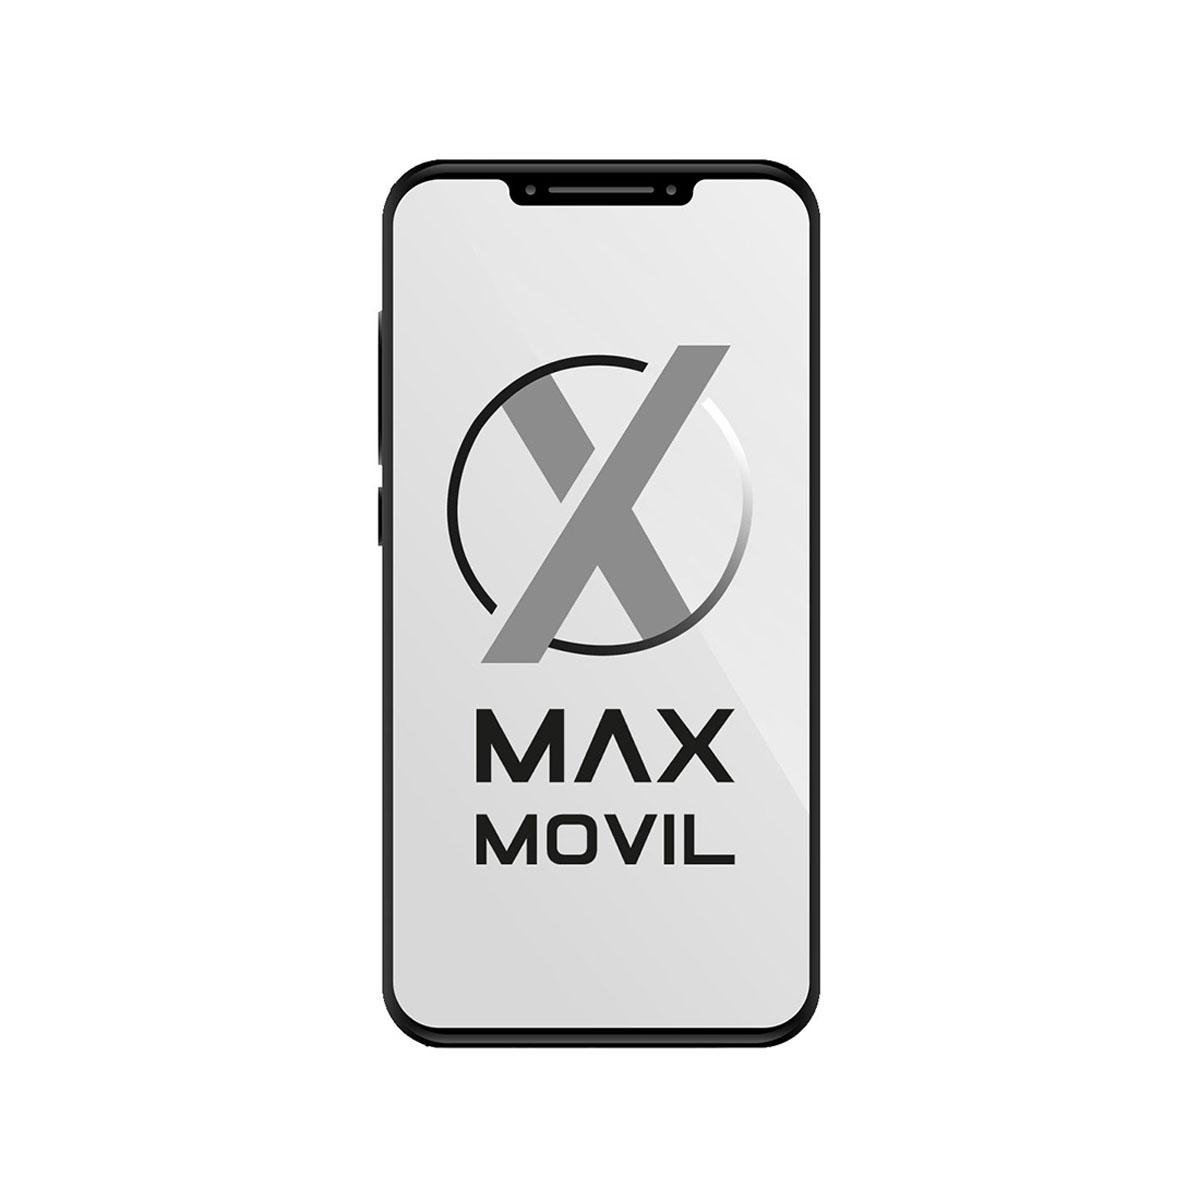 Modulo Panasonic KX-NS5172 de 16 extensiones digitales (DLC16)